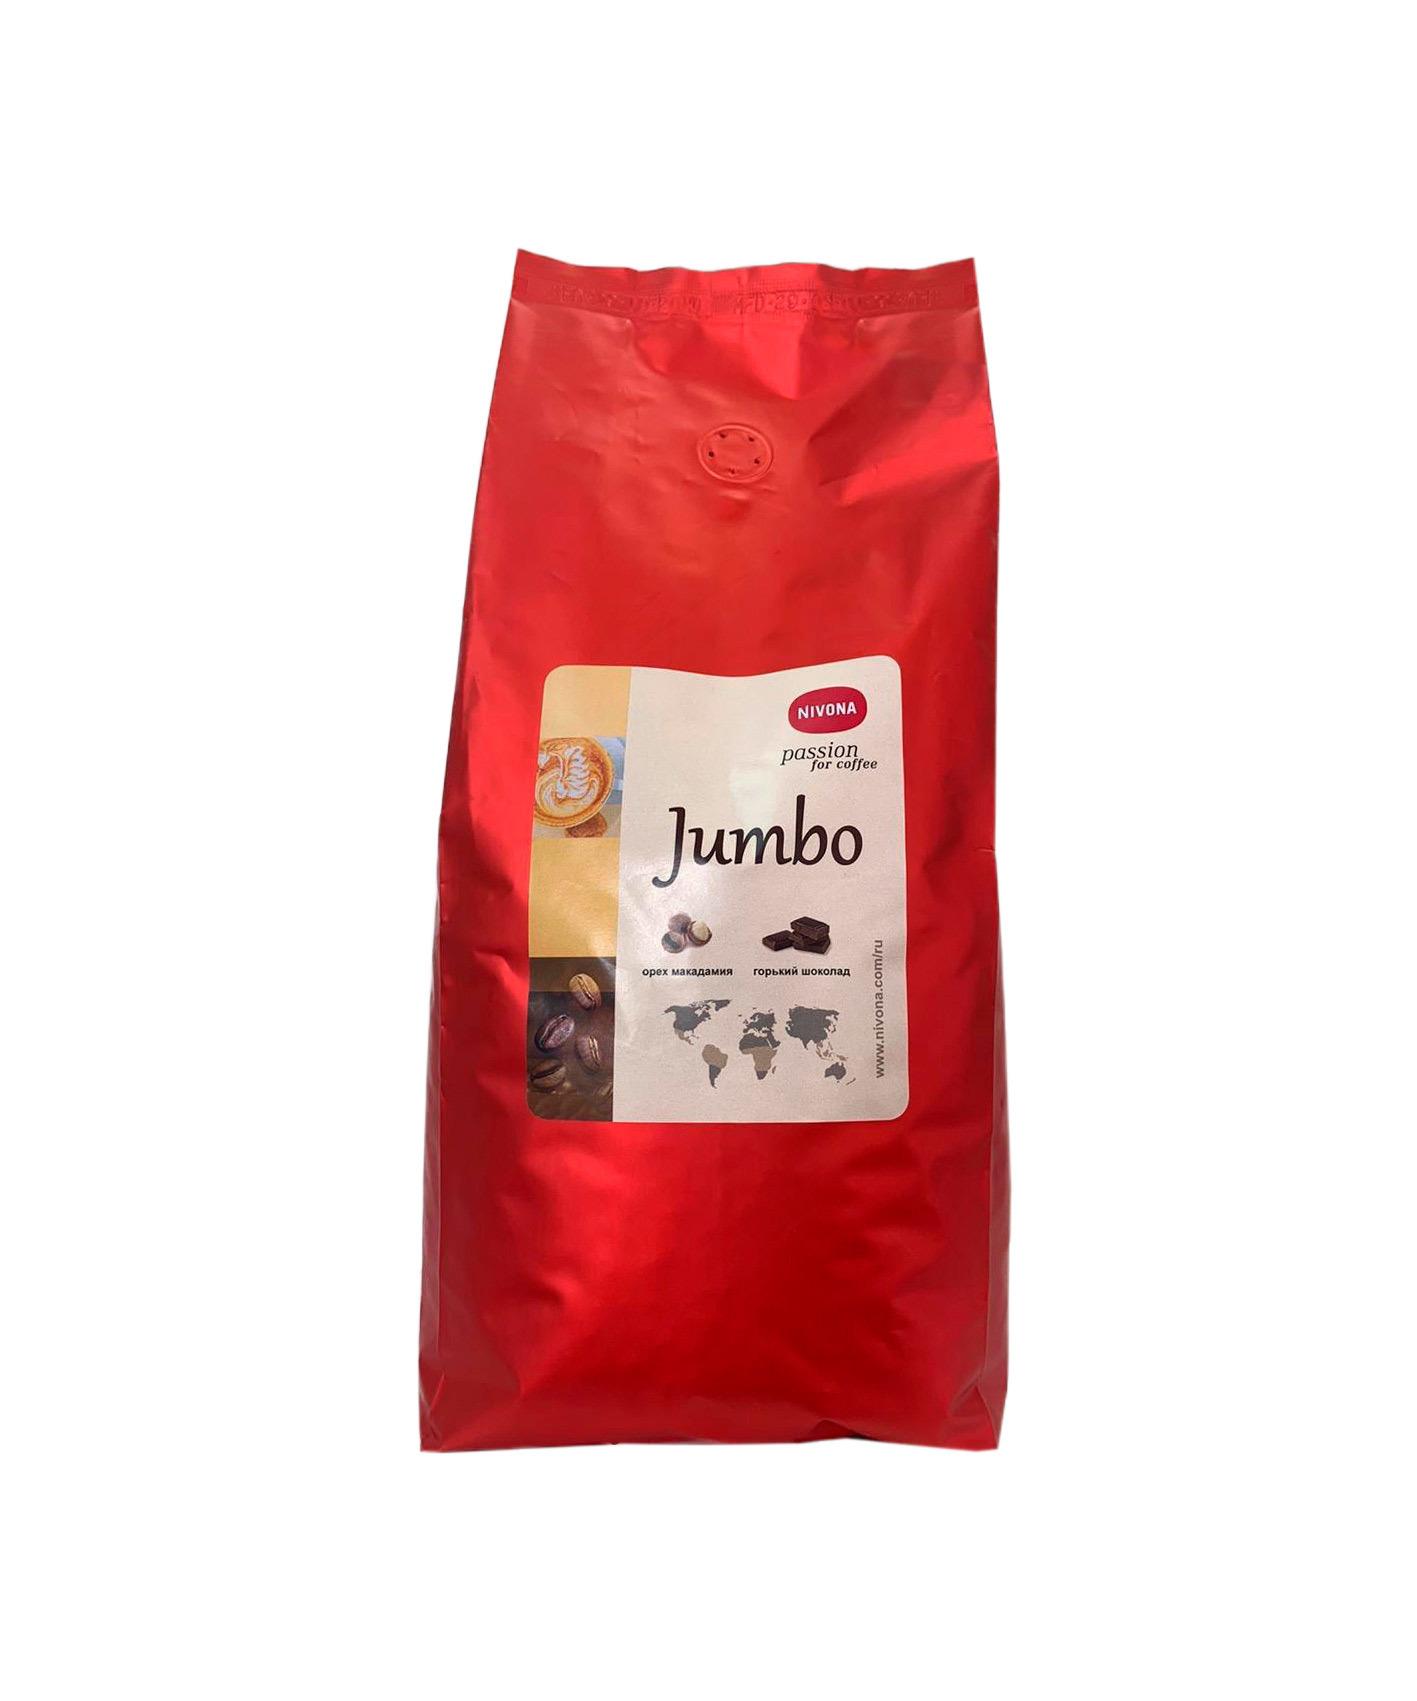 Кофе в зернах Nivona Jumbo, 500 г